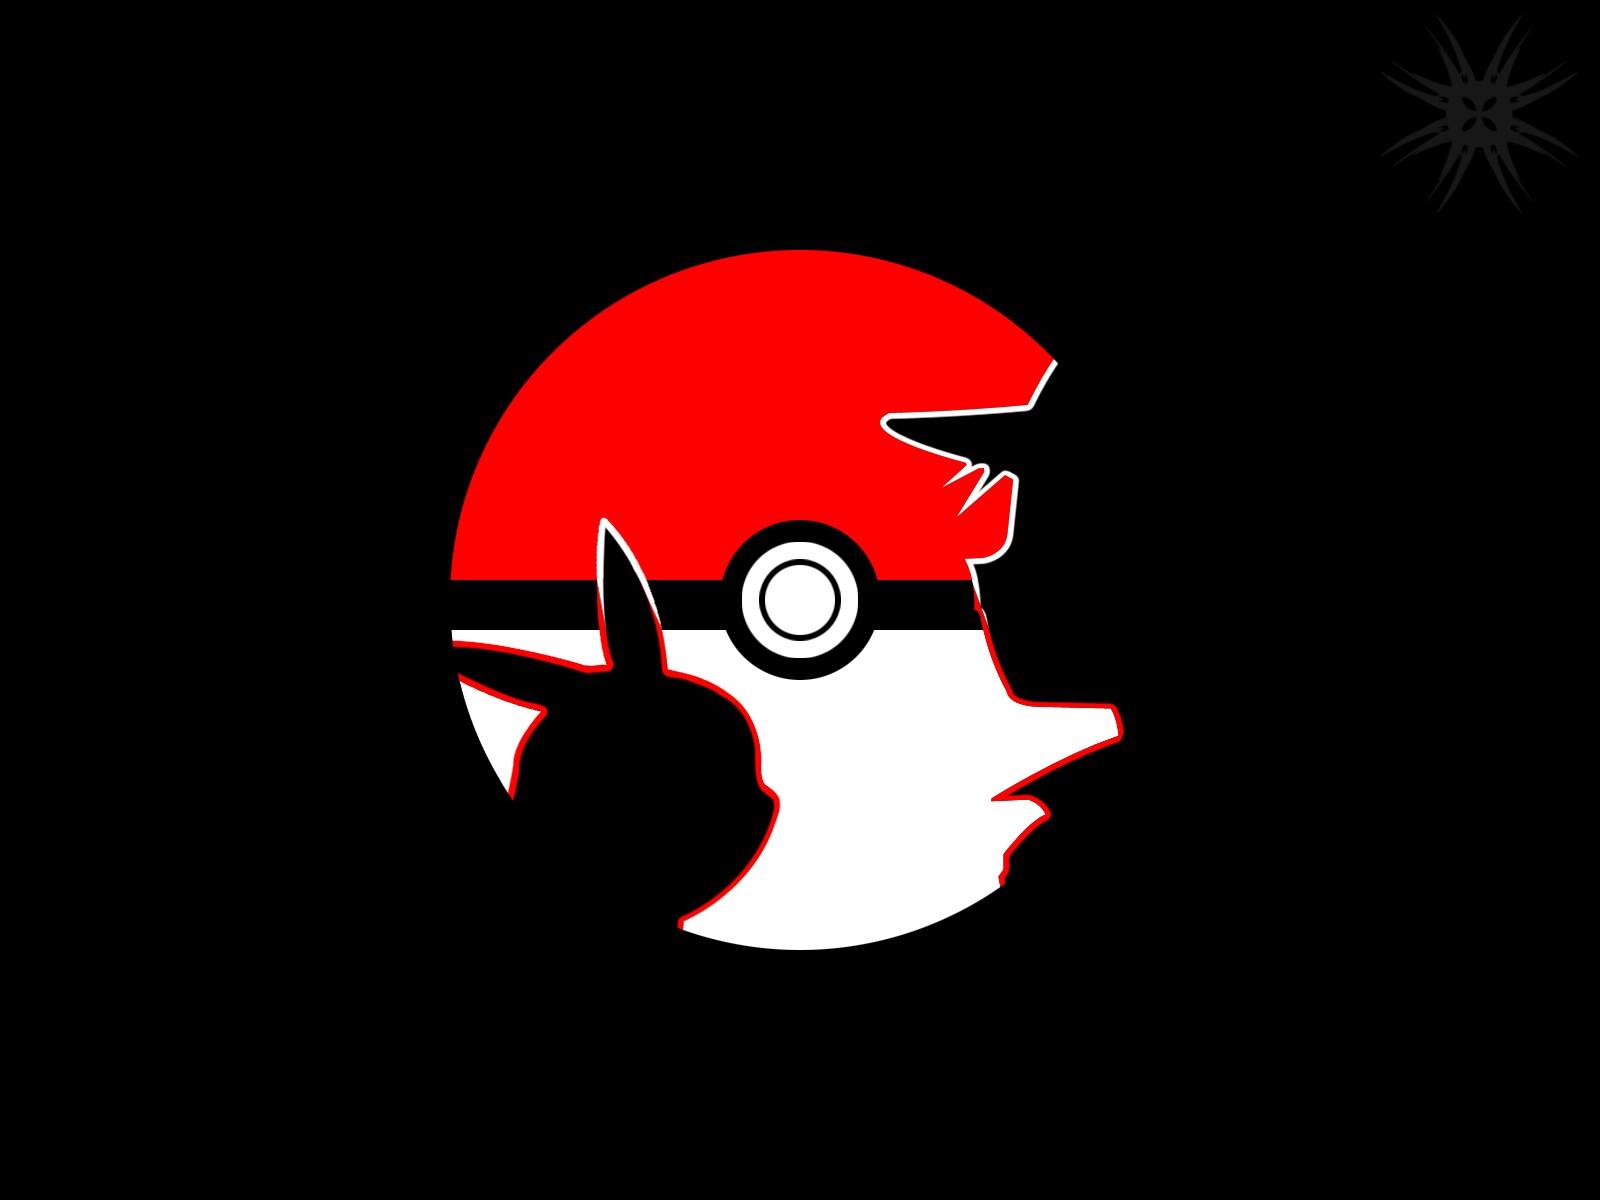 Wallpaper White Black Illustration Red Logo Cartoon